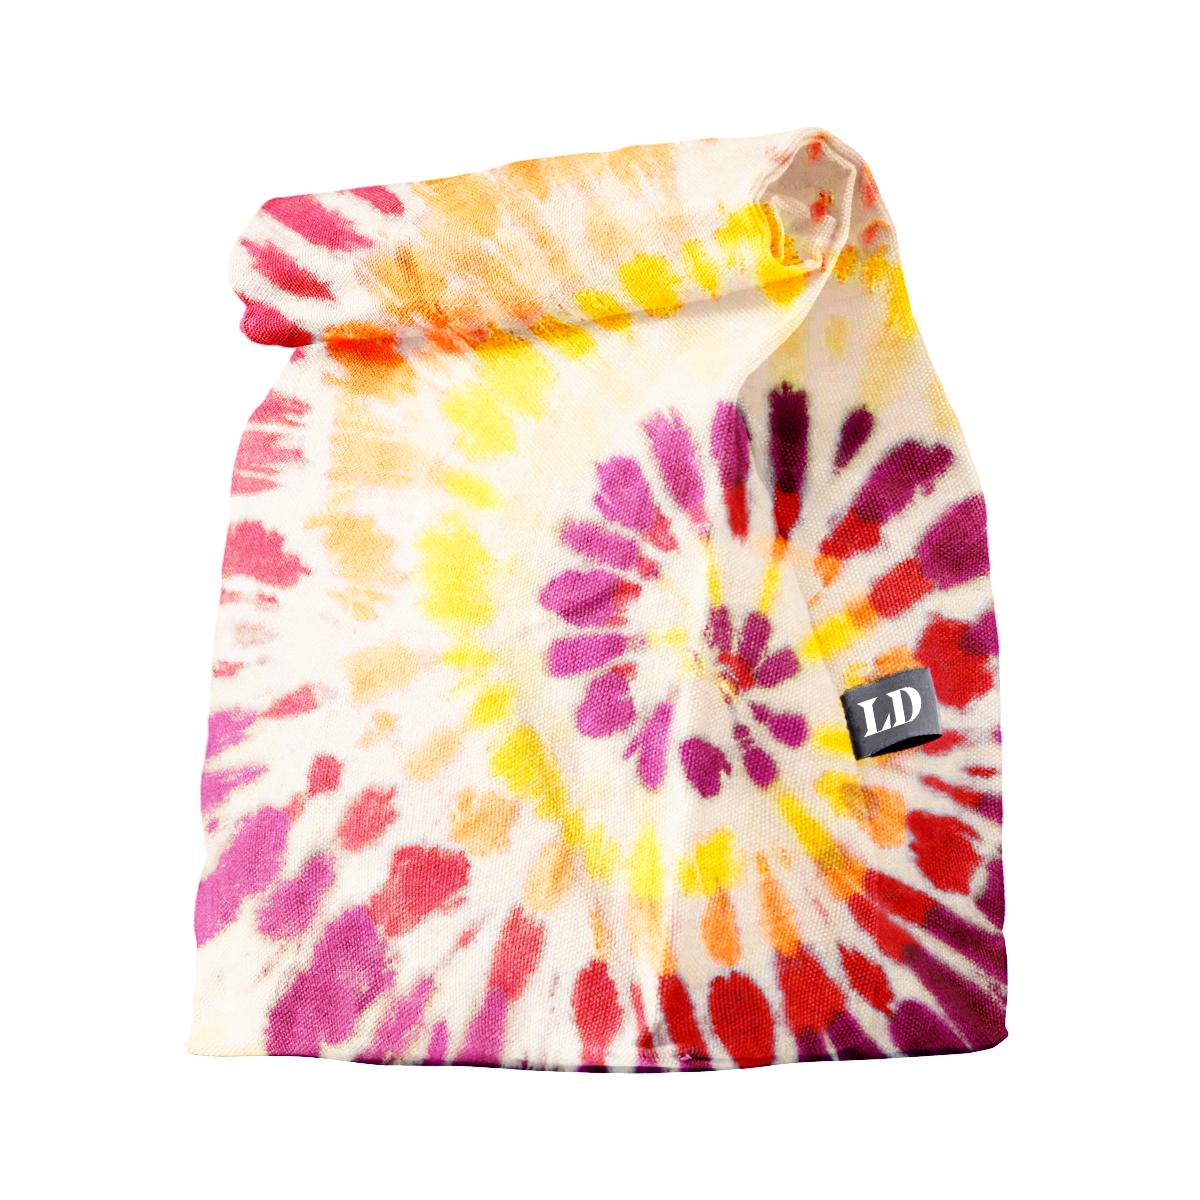 Tie Dye Lunch Sack